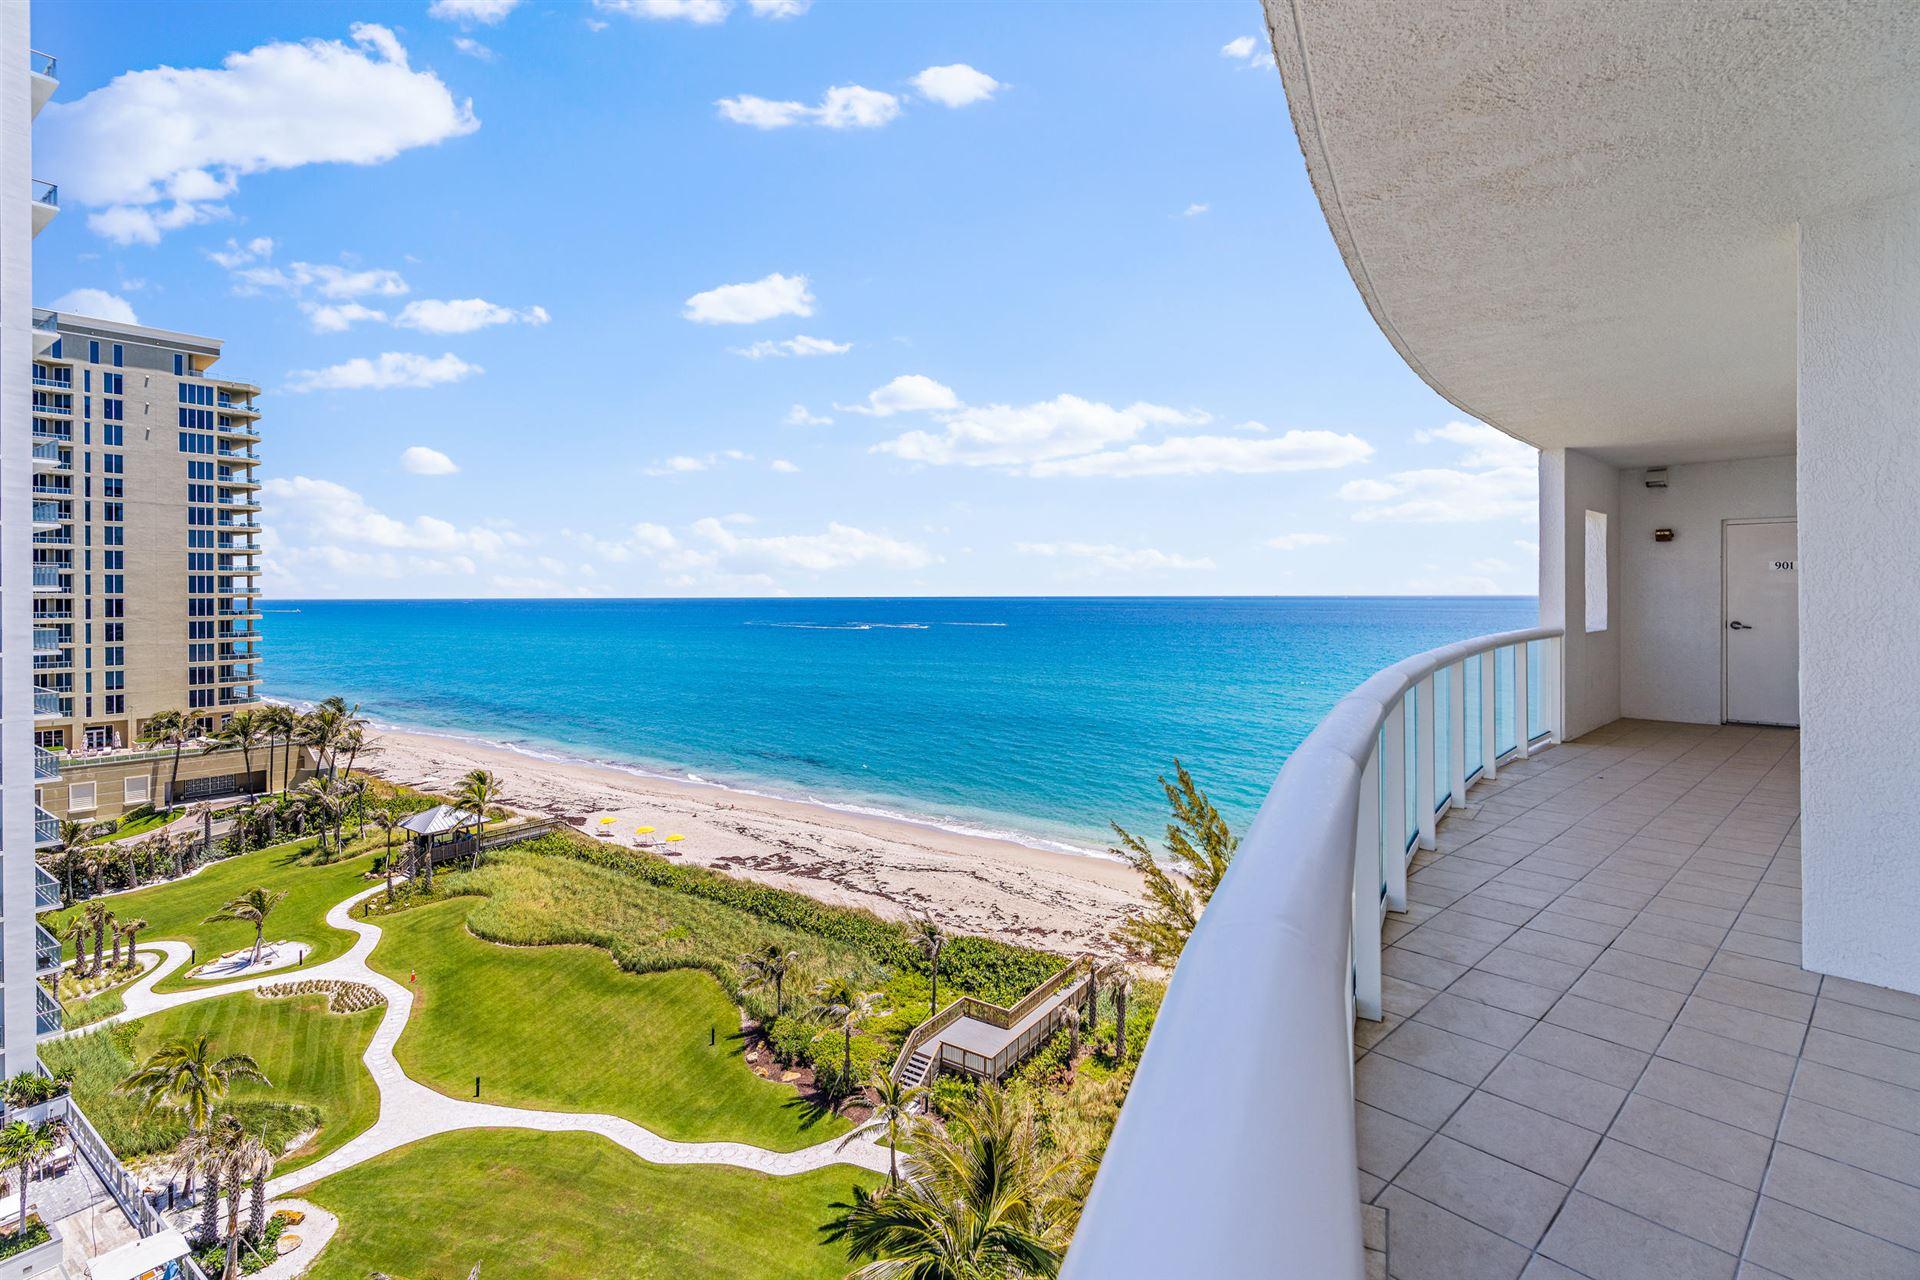 4600 N Ocean Drive #902, Riviera Beach, FL 33404 - MLS#: RX-10722131